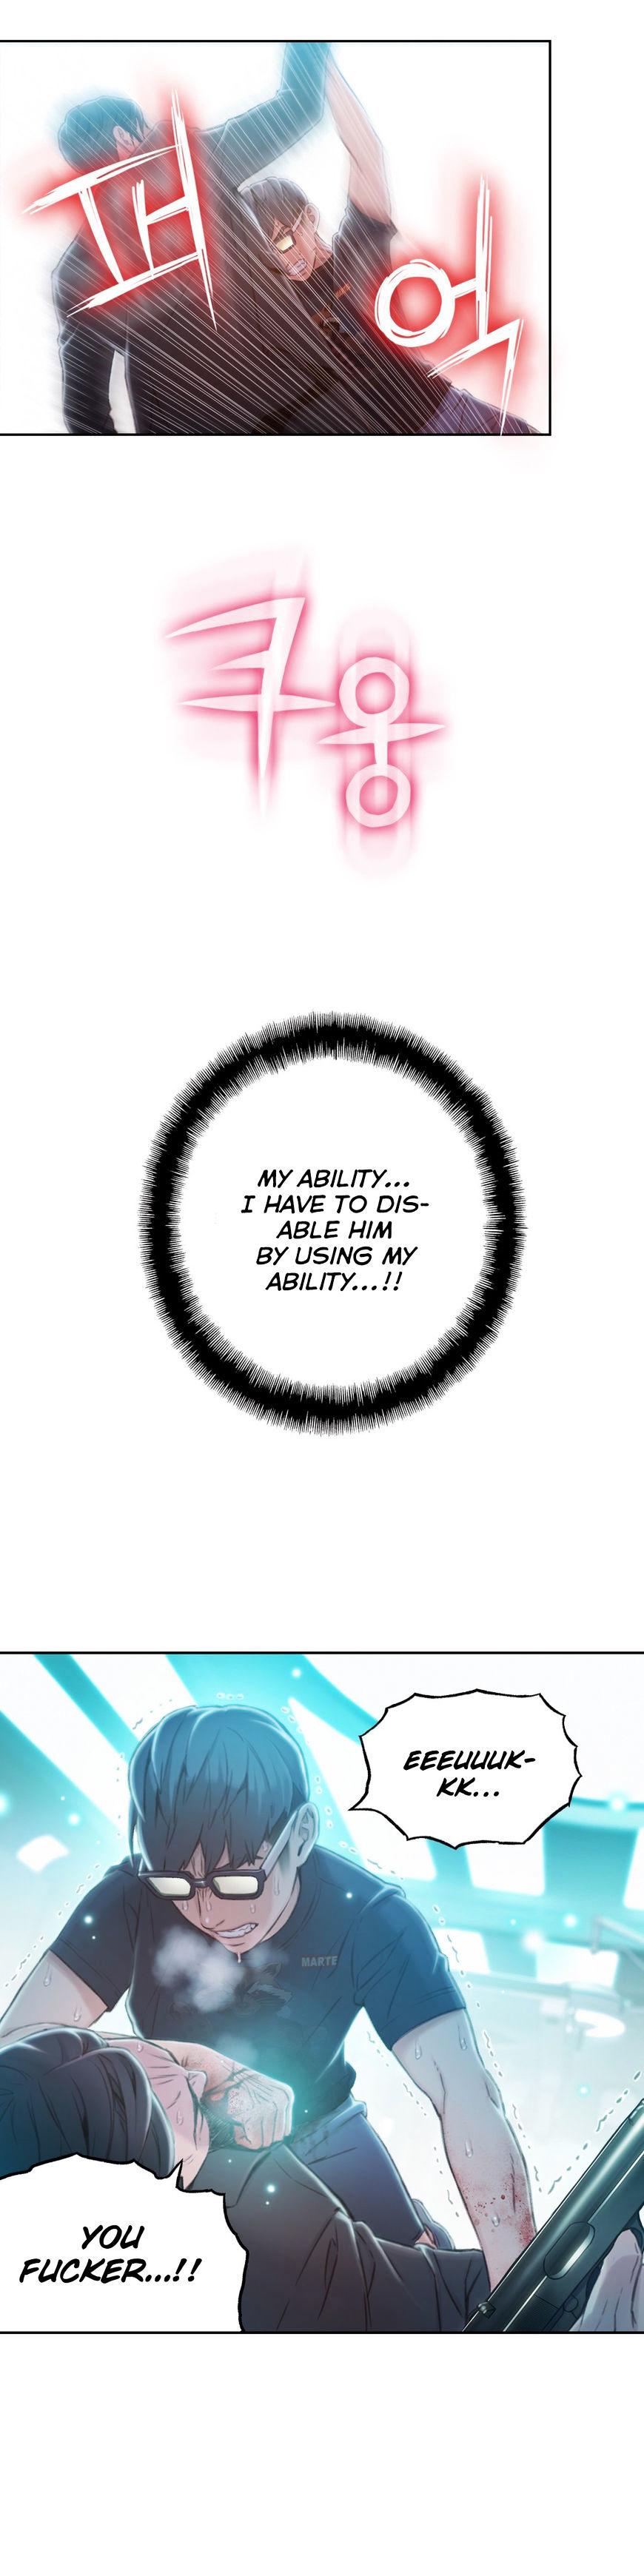 Sweet Guy Chapter 73 Full Manga Read Scan Image 22